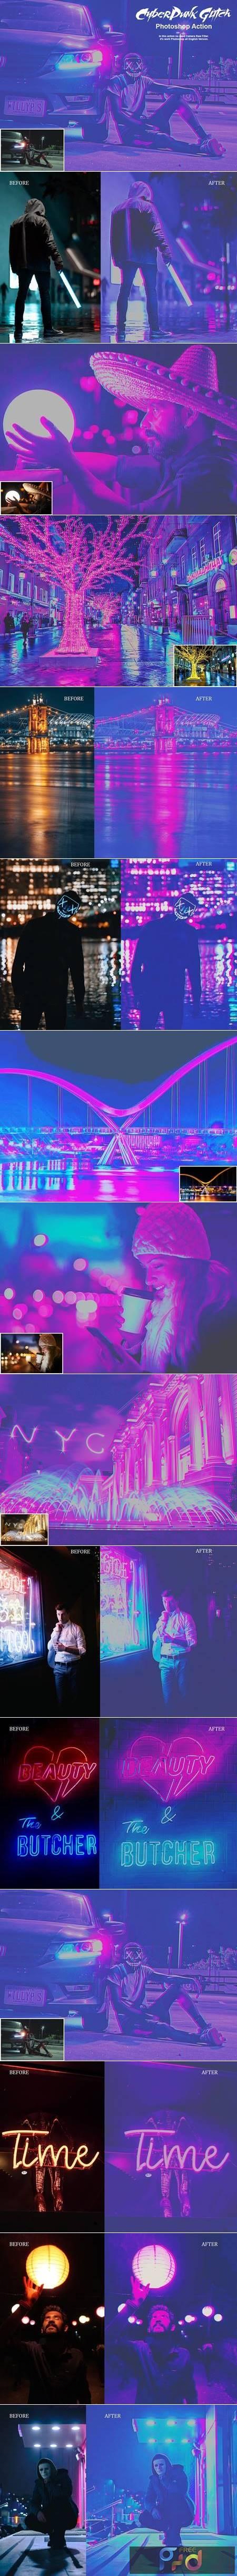 CyberPunk Glitch Photoshop Action 5302804 1